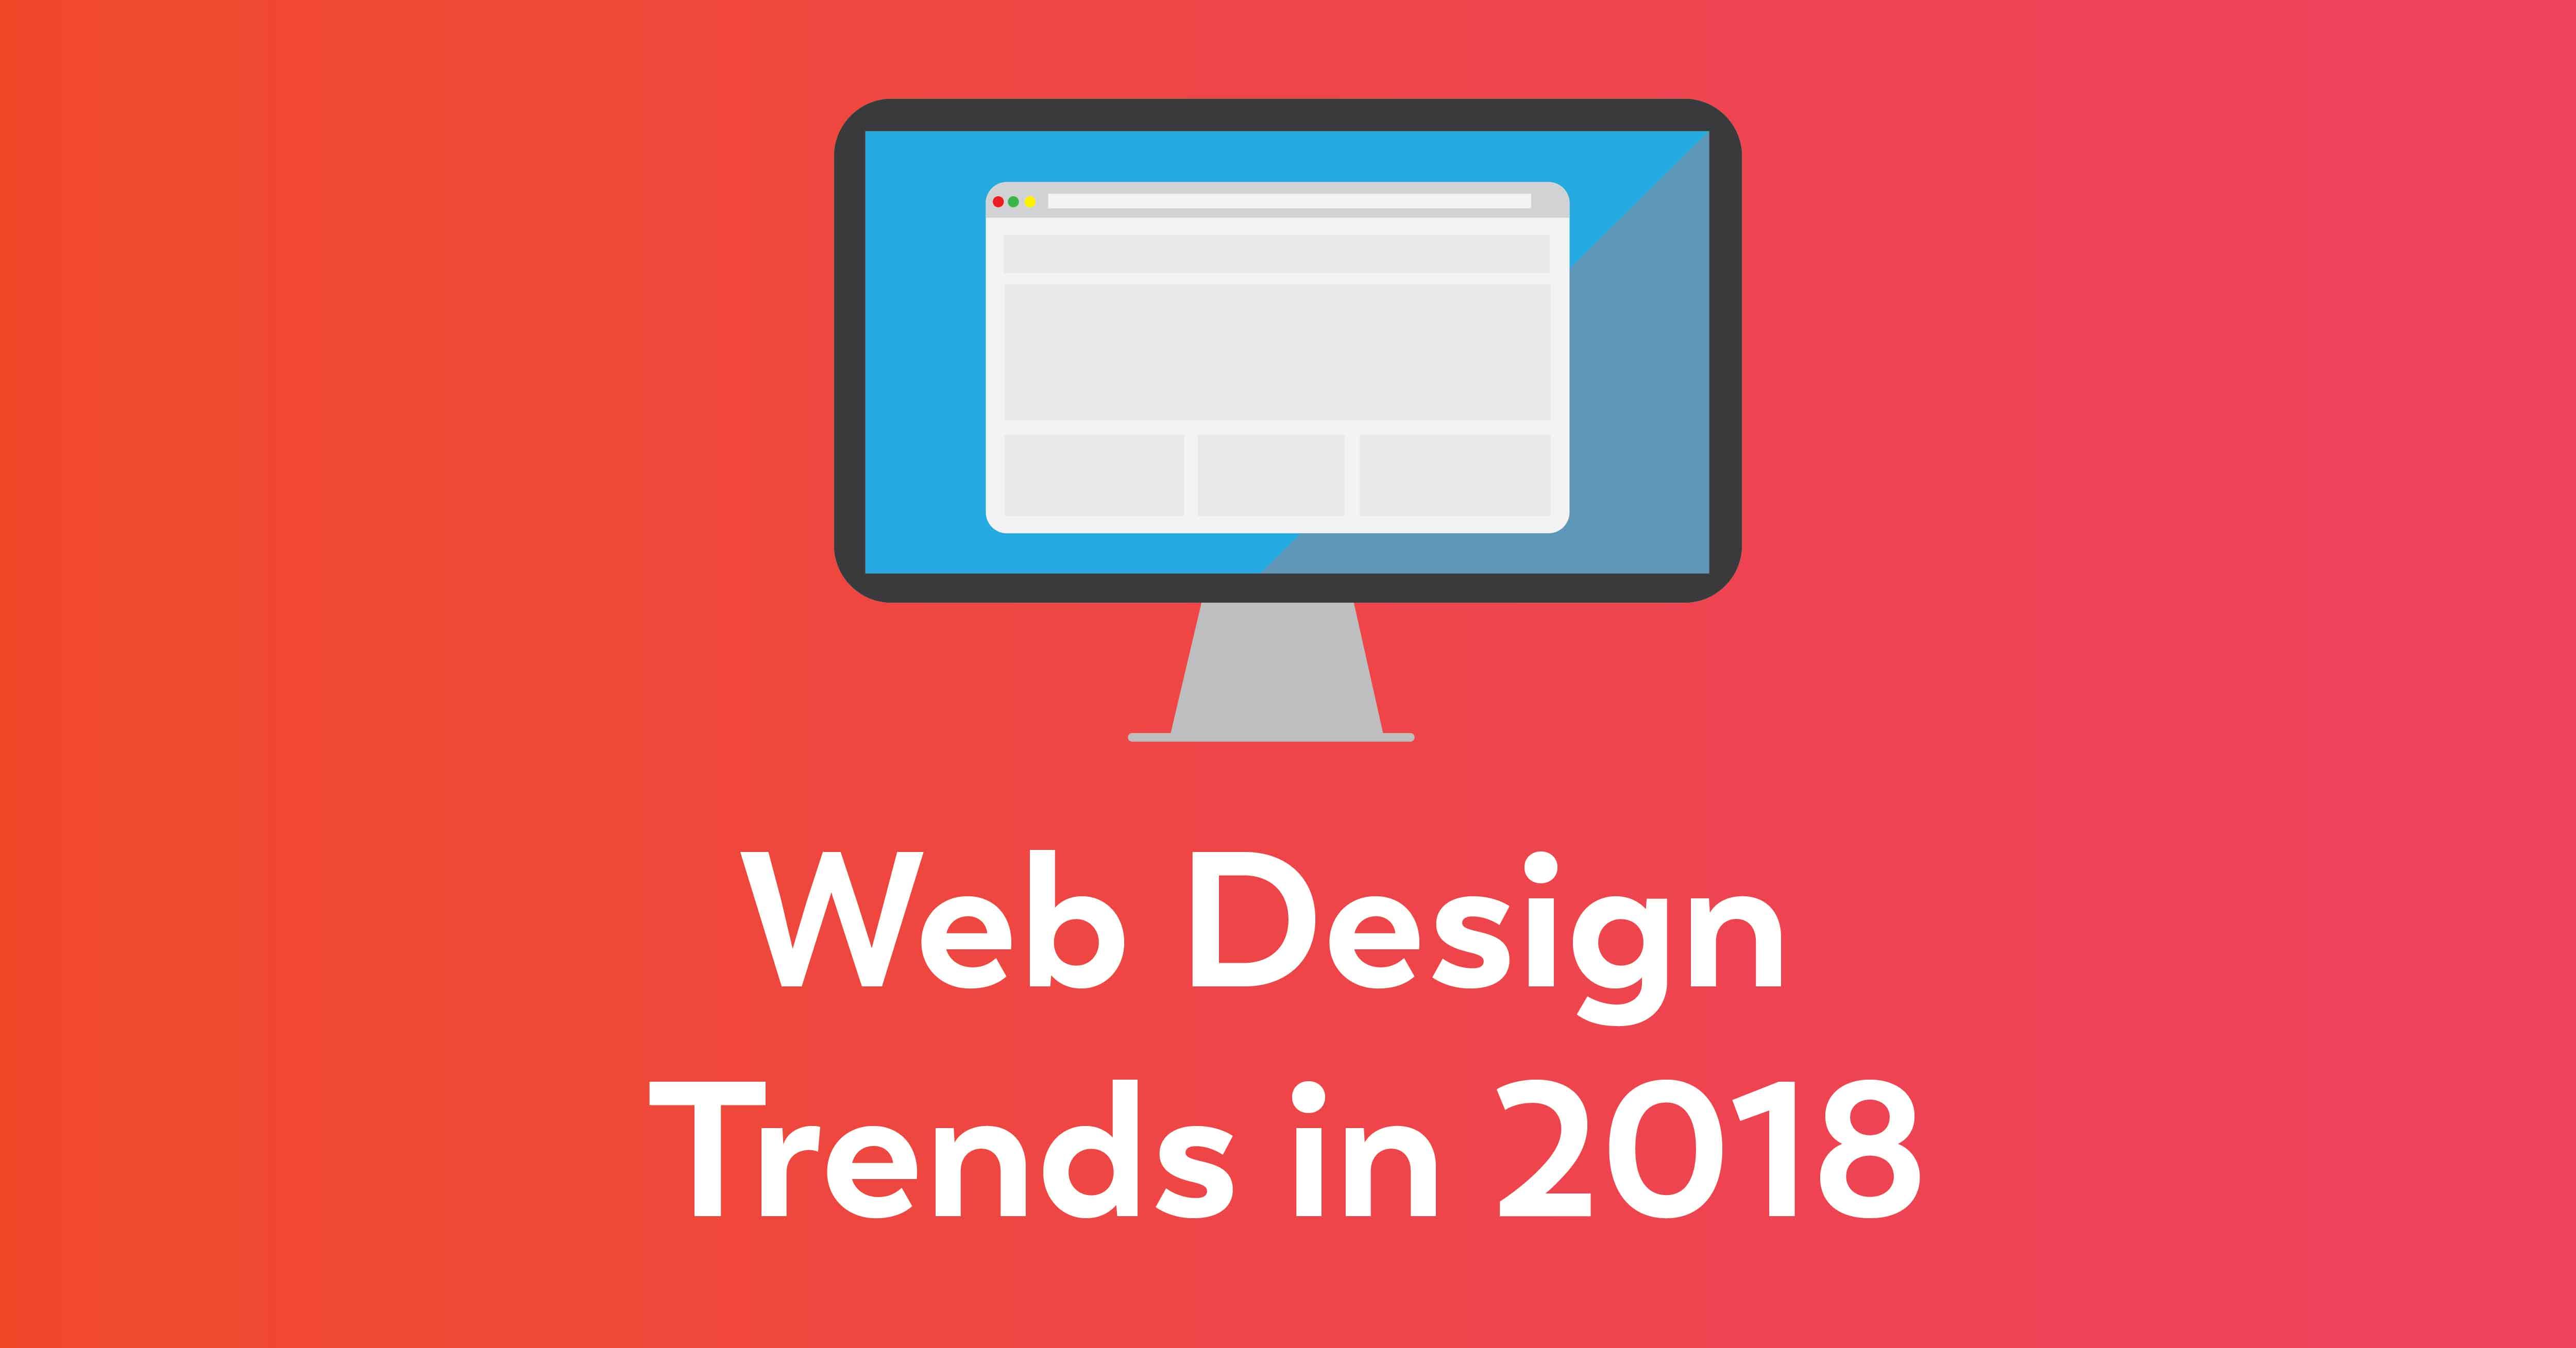 Web Design Trends in 2018